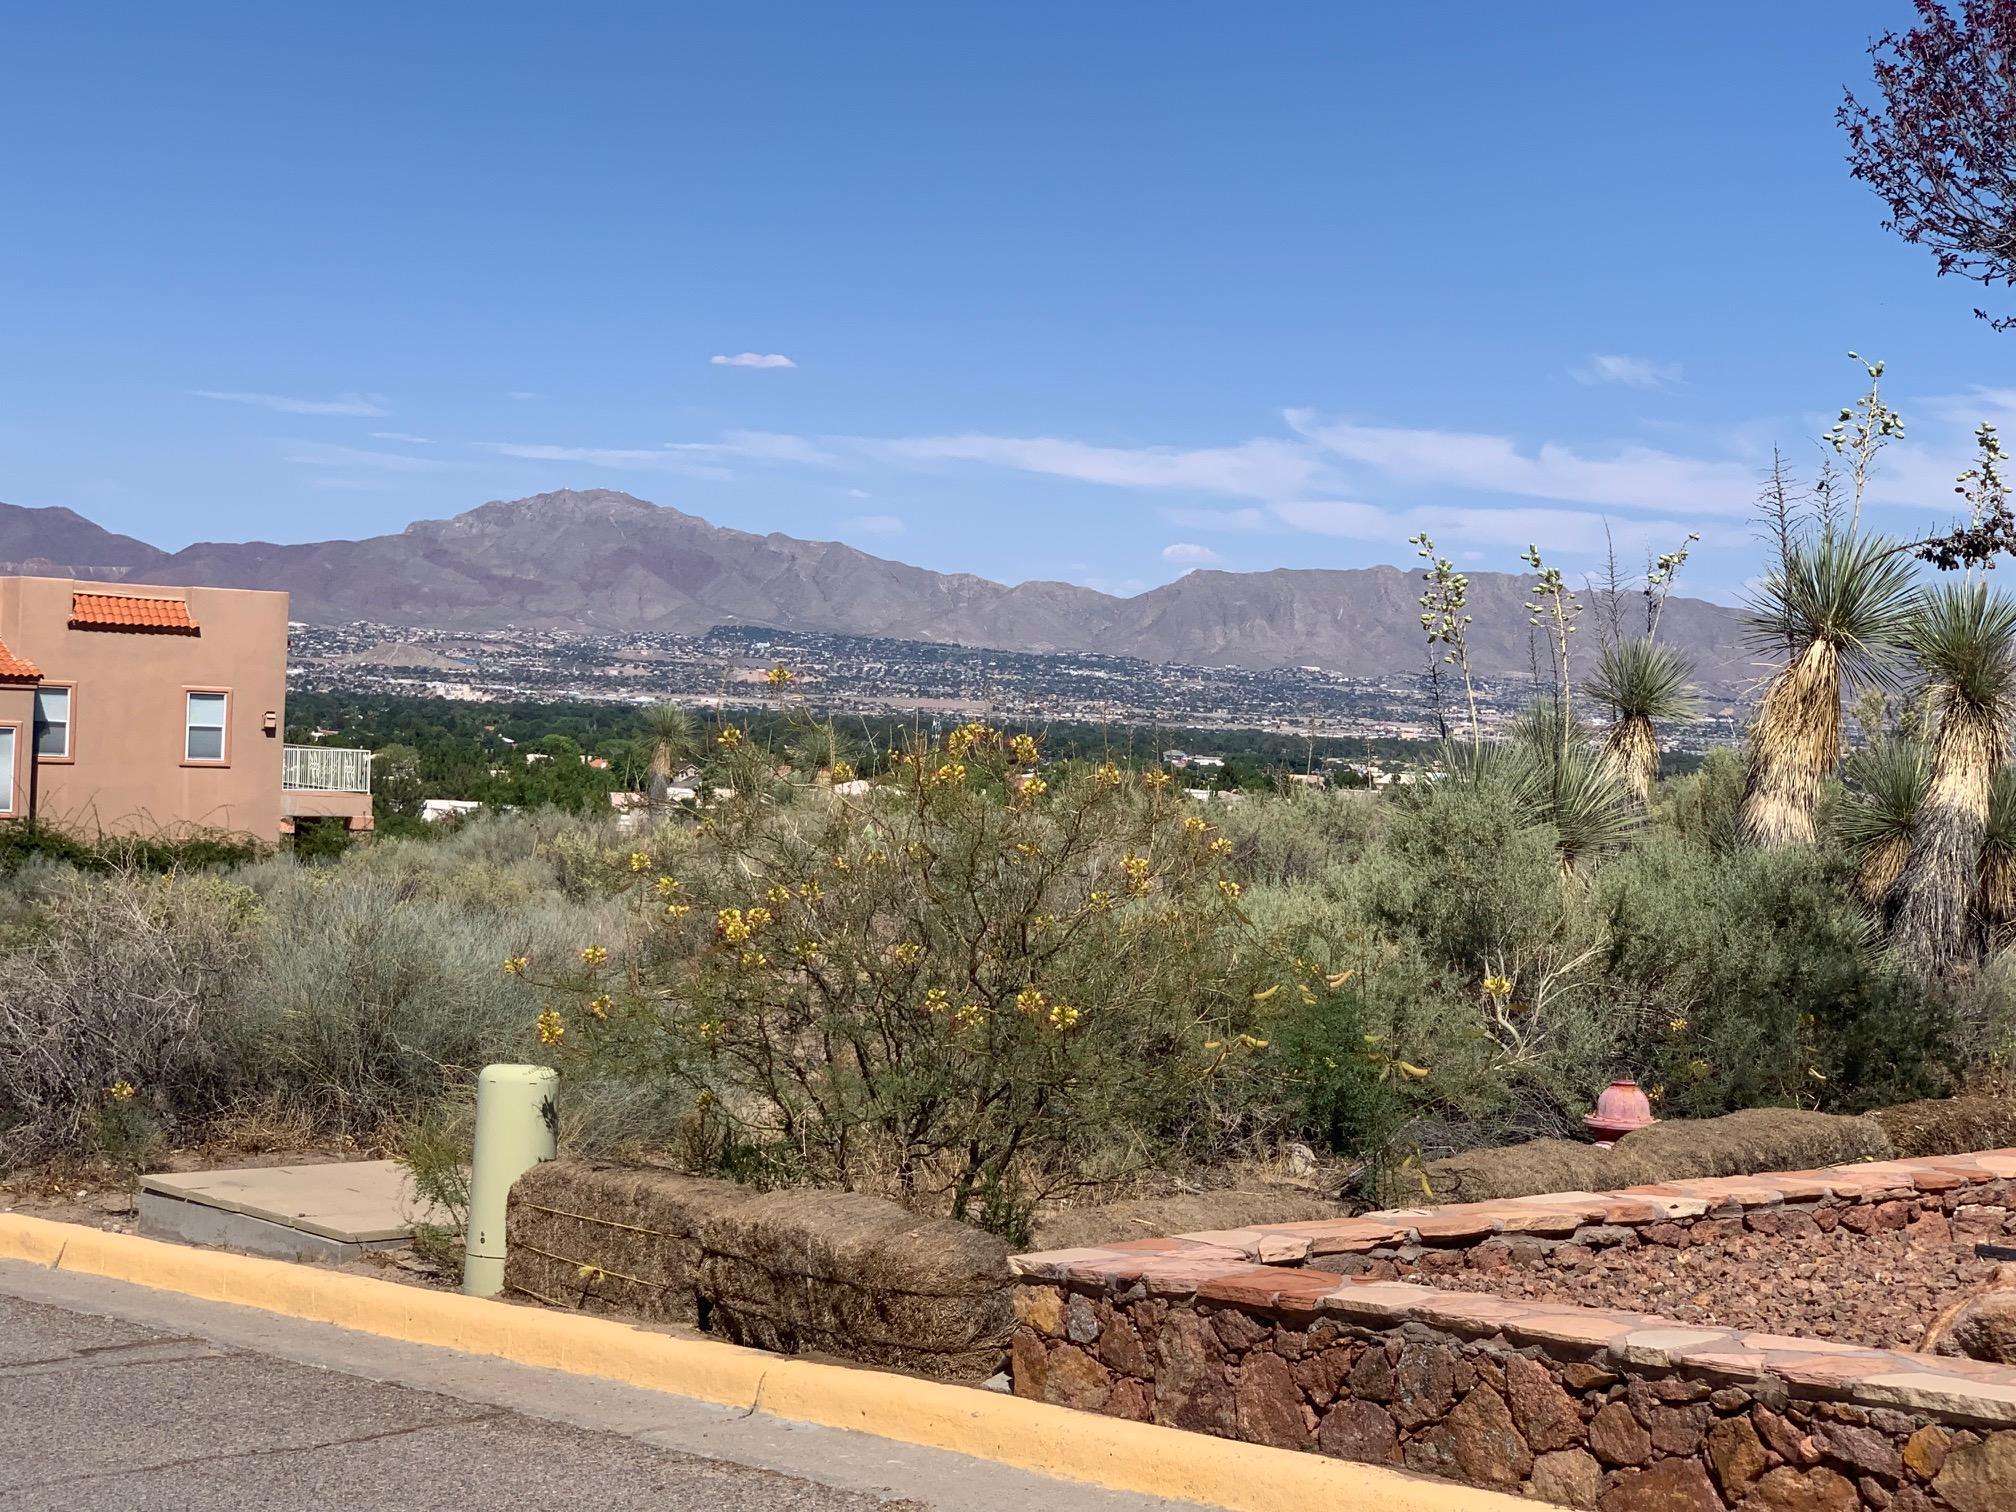 41 Trevino Road, Santa Teresa, New Mexico 88008, ,Land,For sale,Trevino,811753